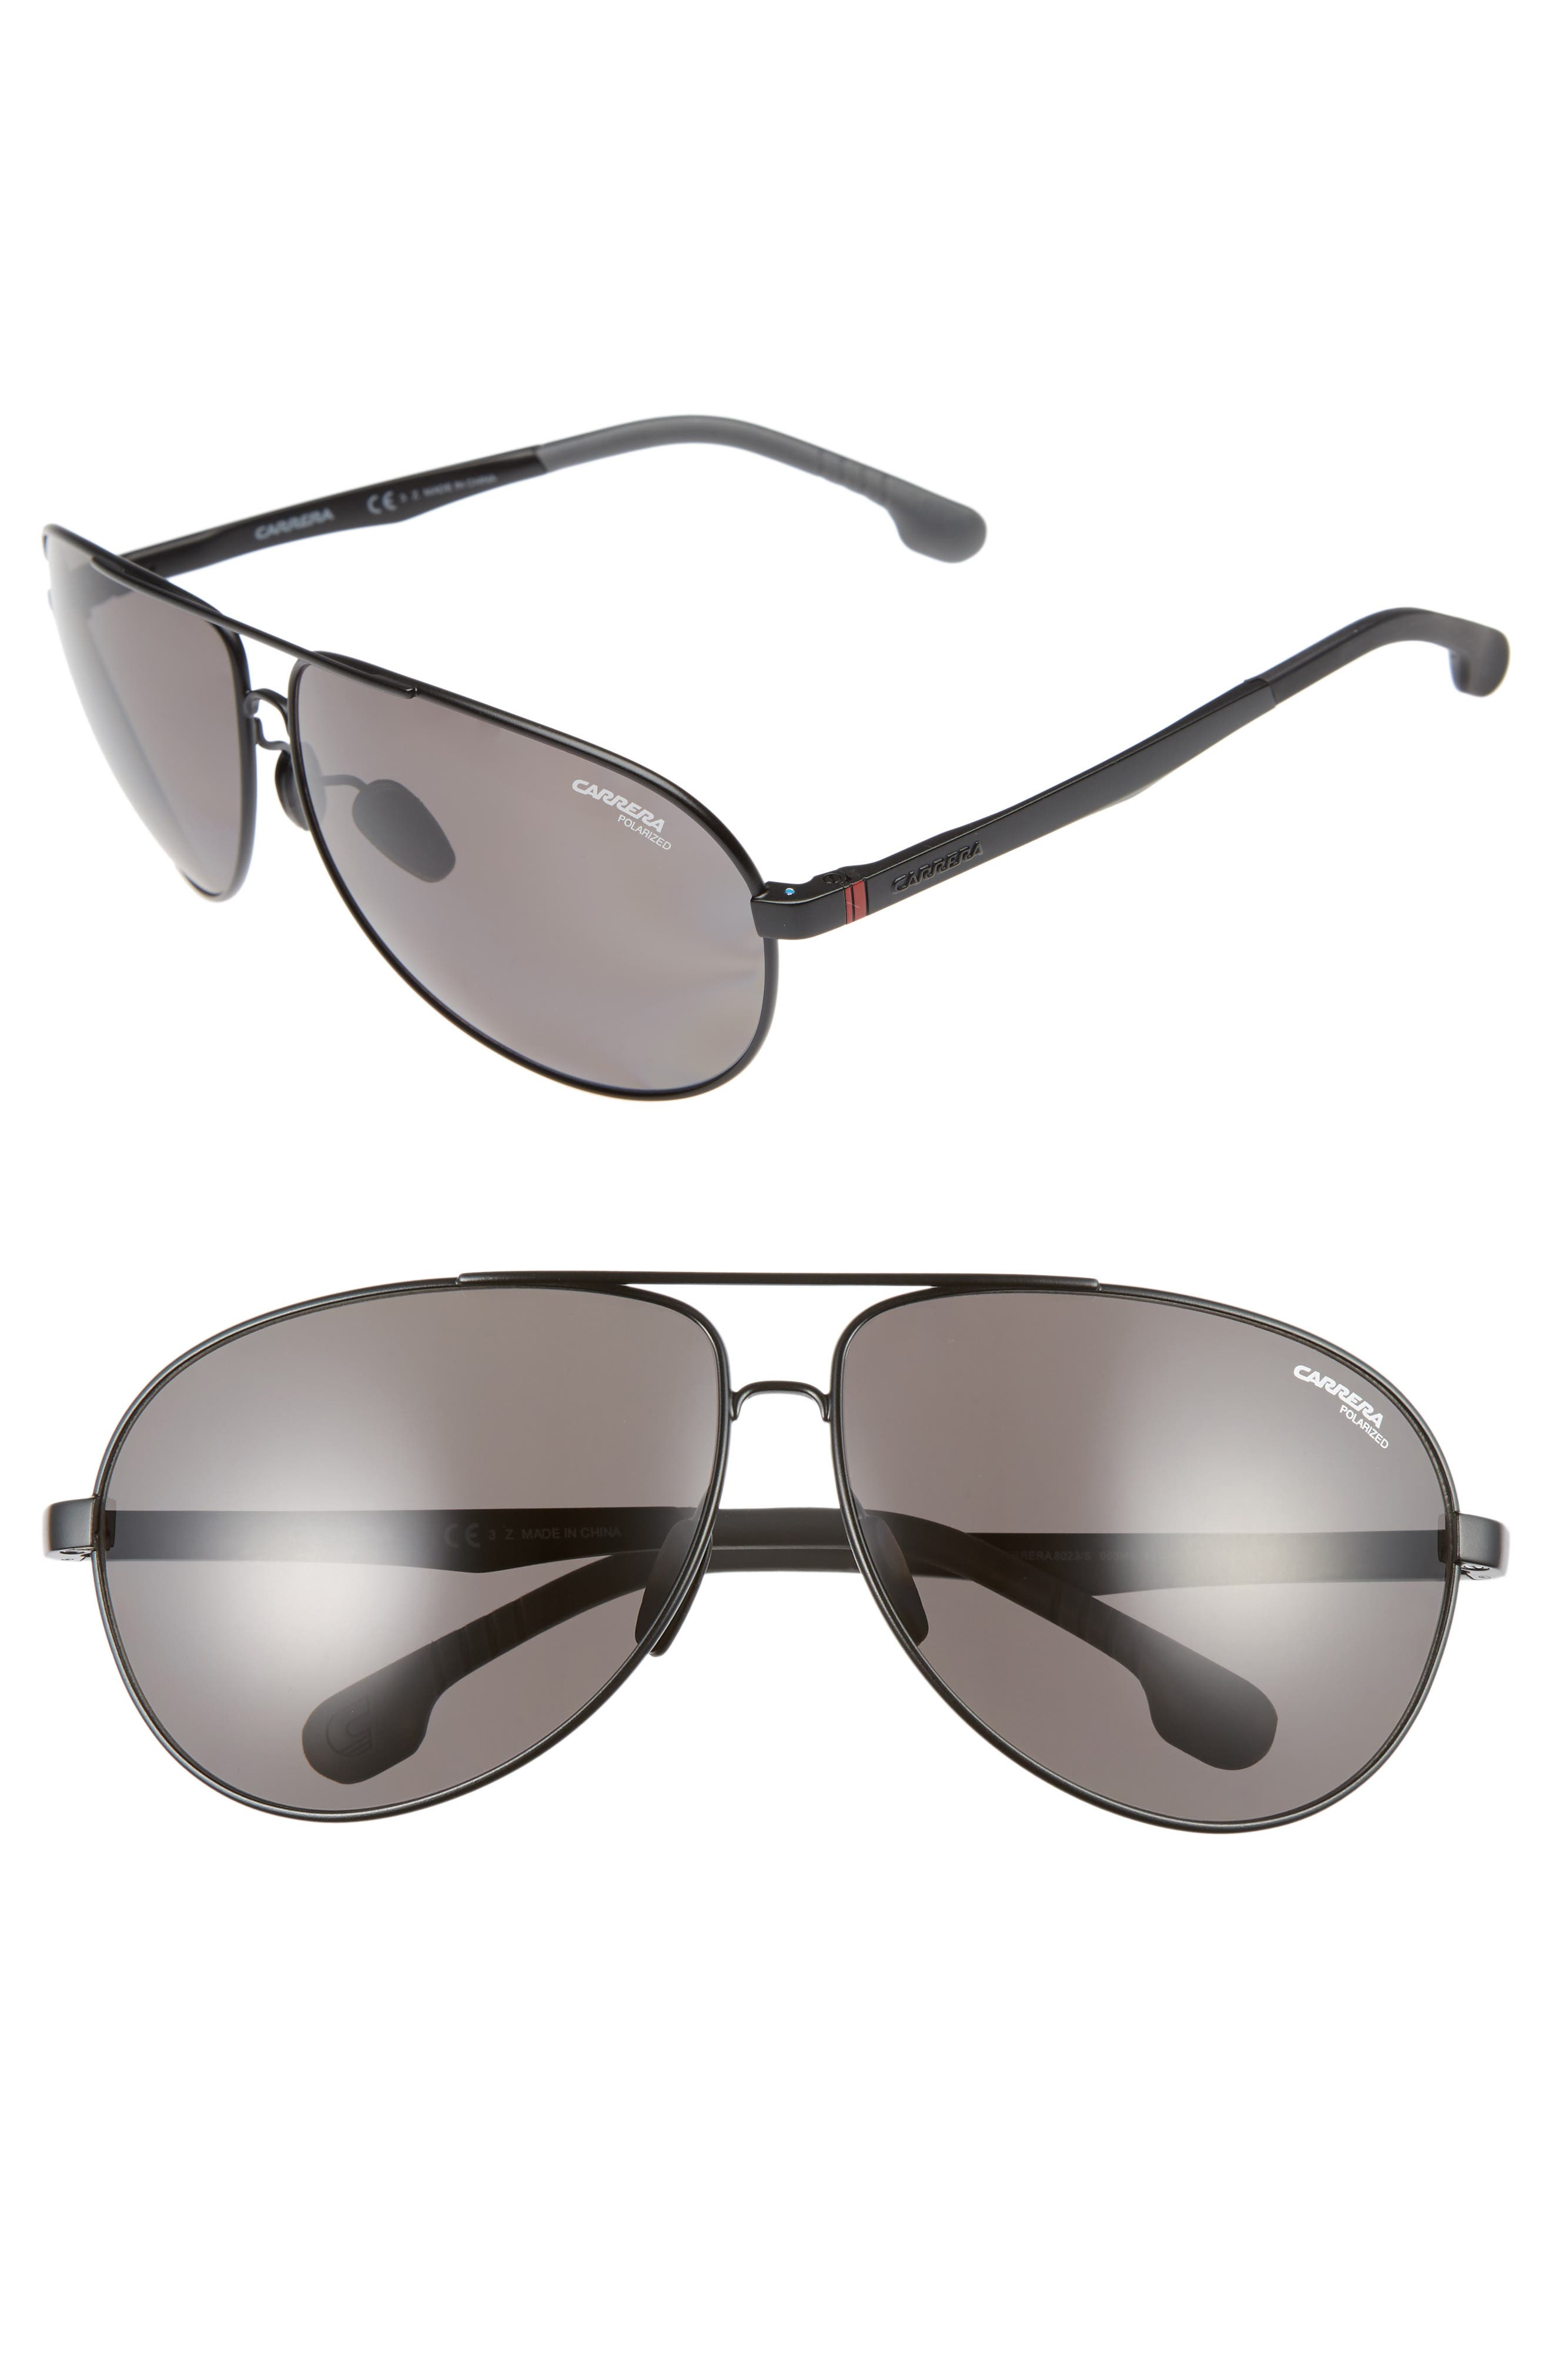 Main Image - Carrera Eyewear 66mm Polarized Sunglasses